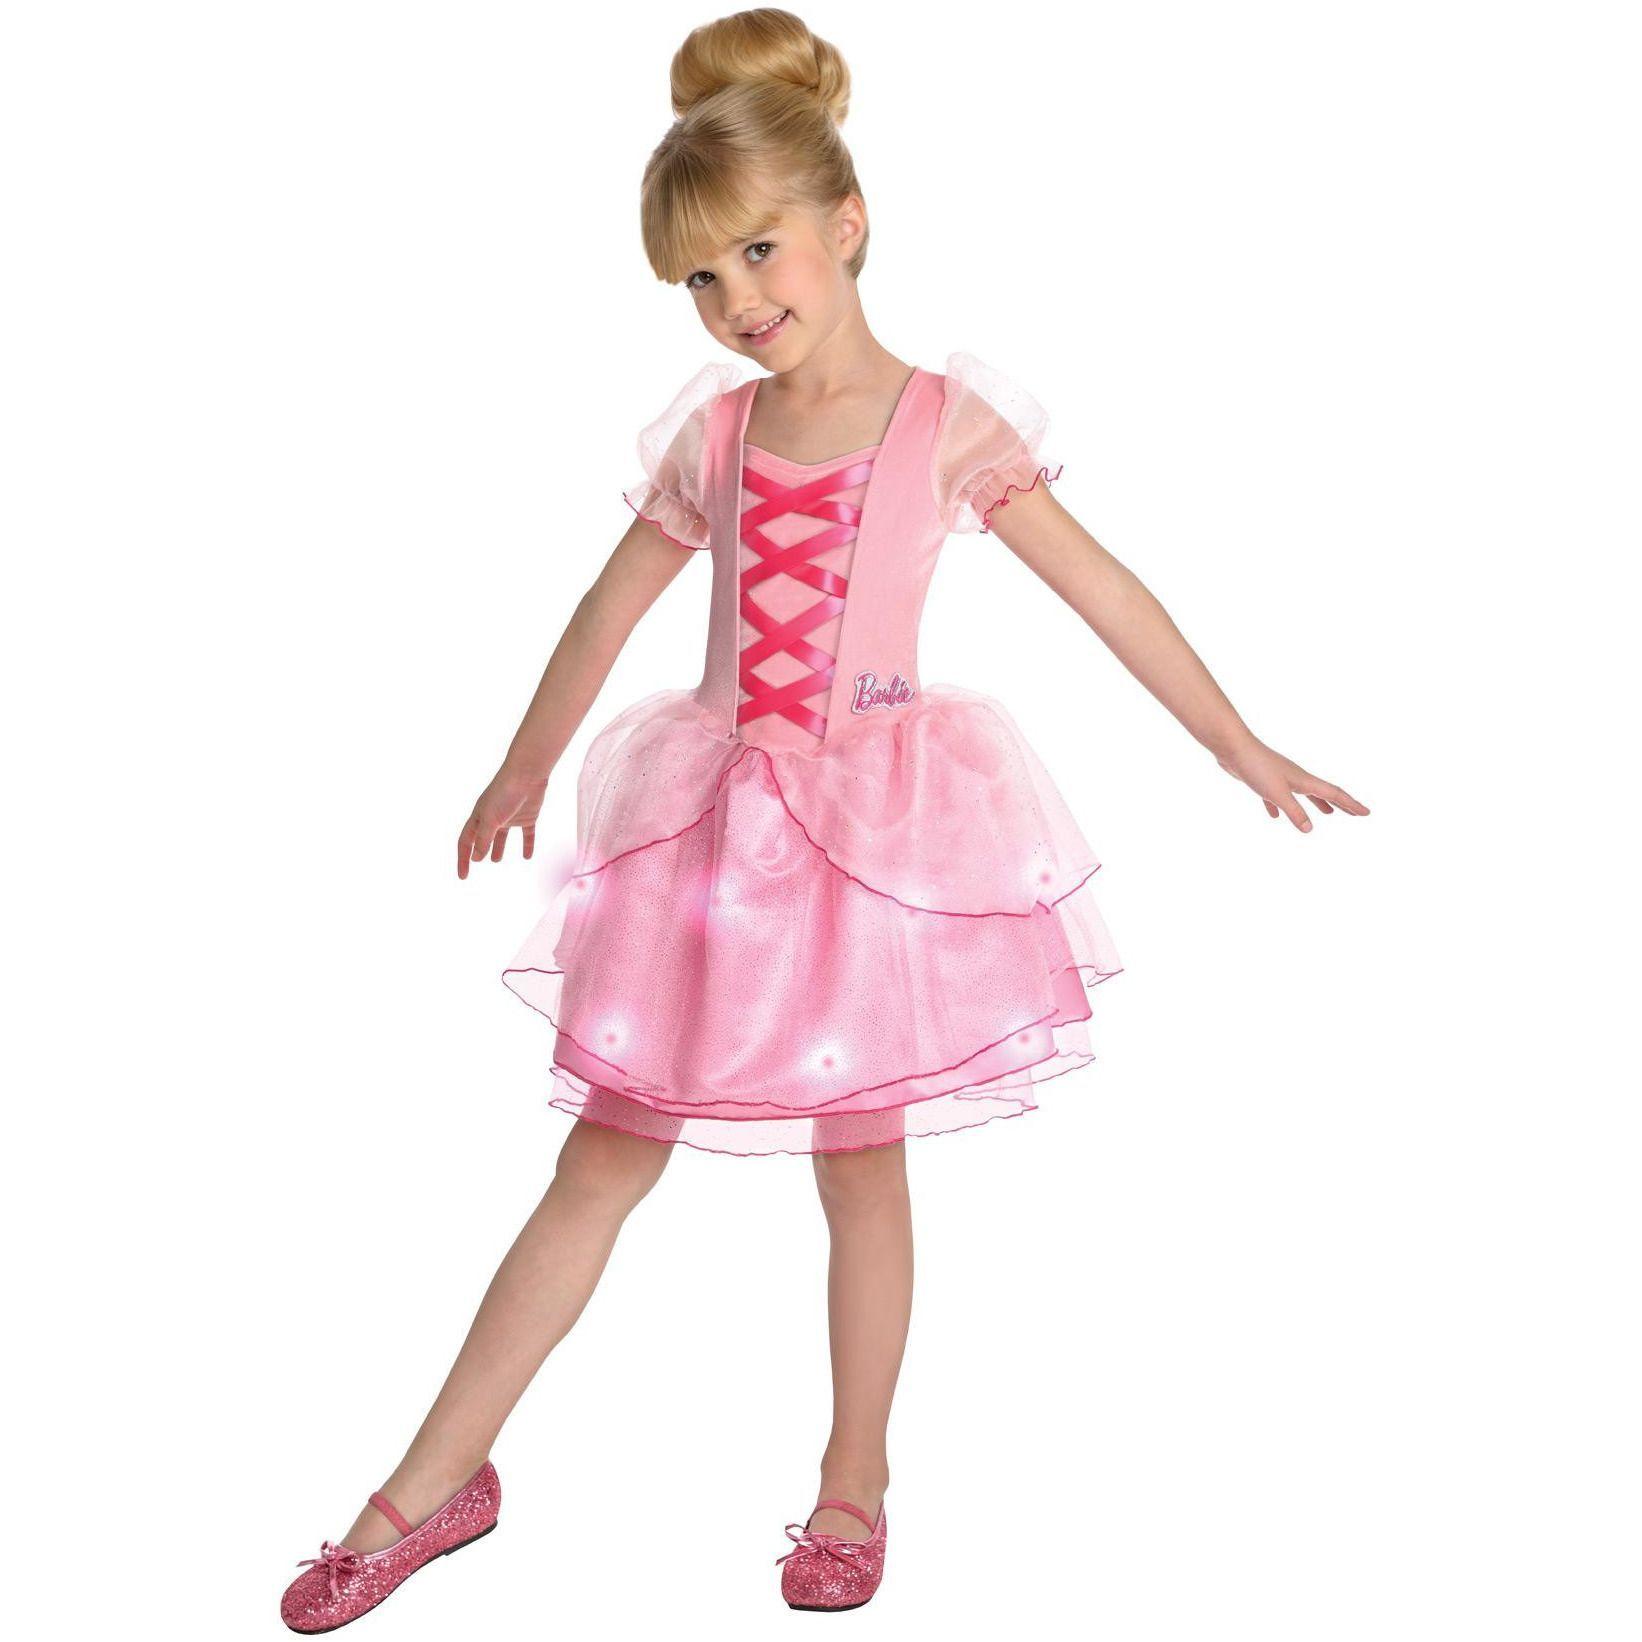 Barbie Ballerina Child Small | Pinterest